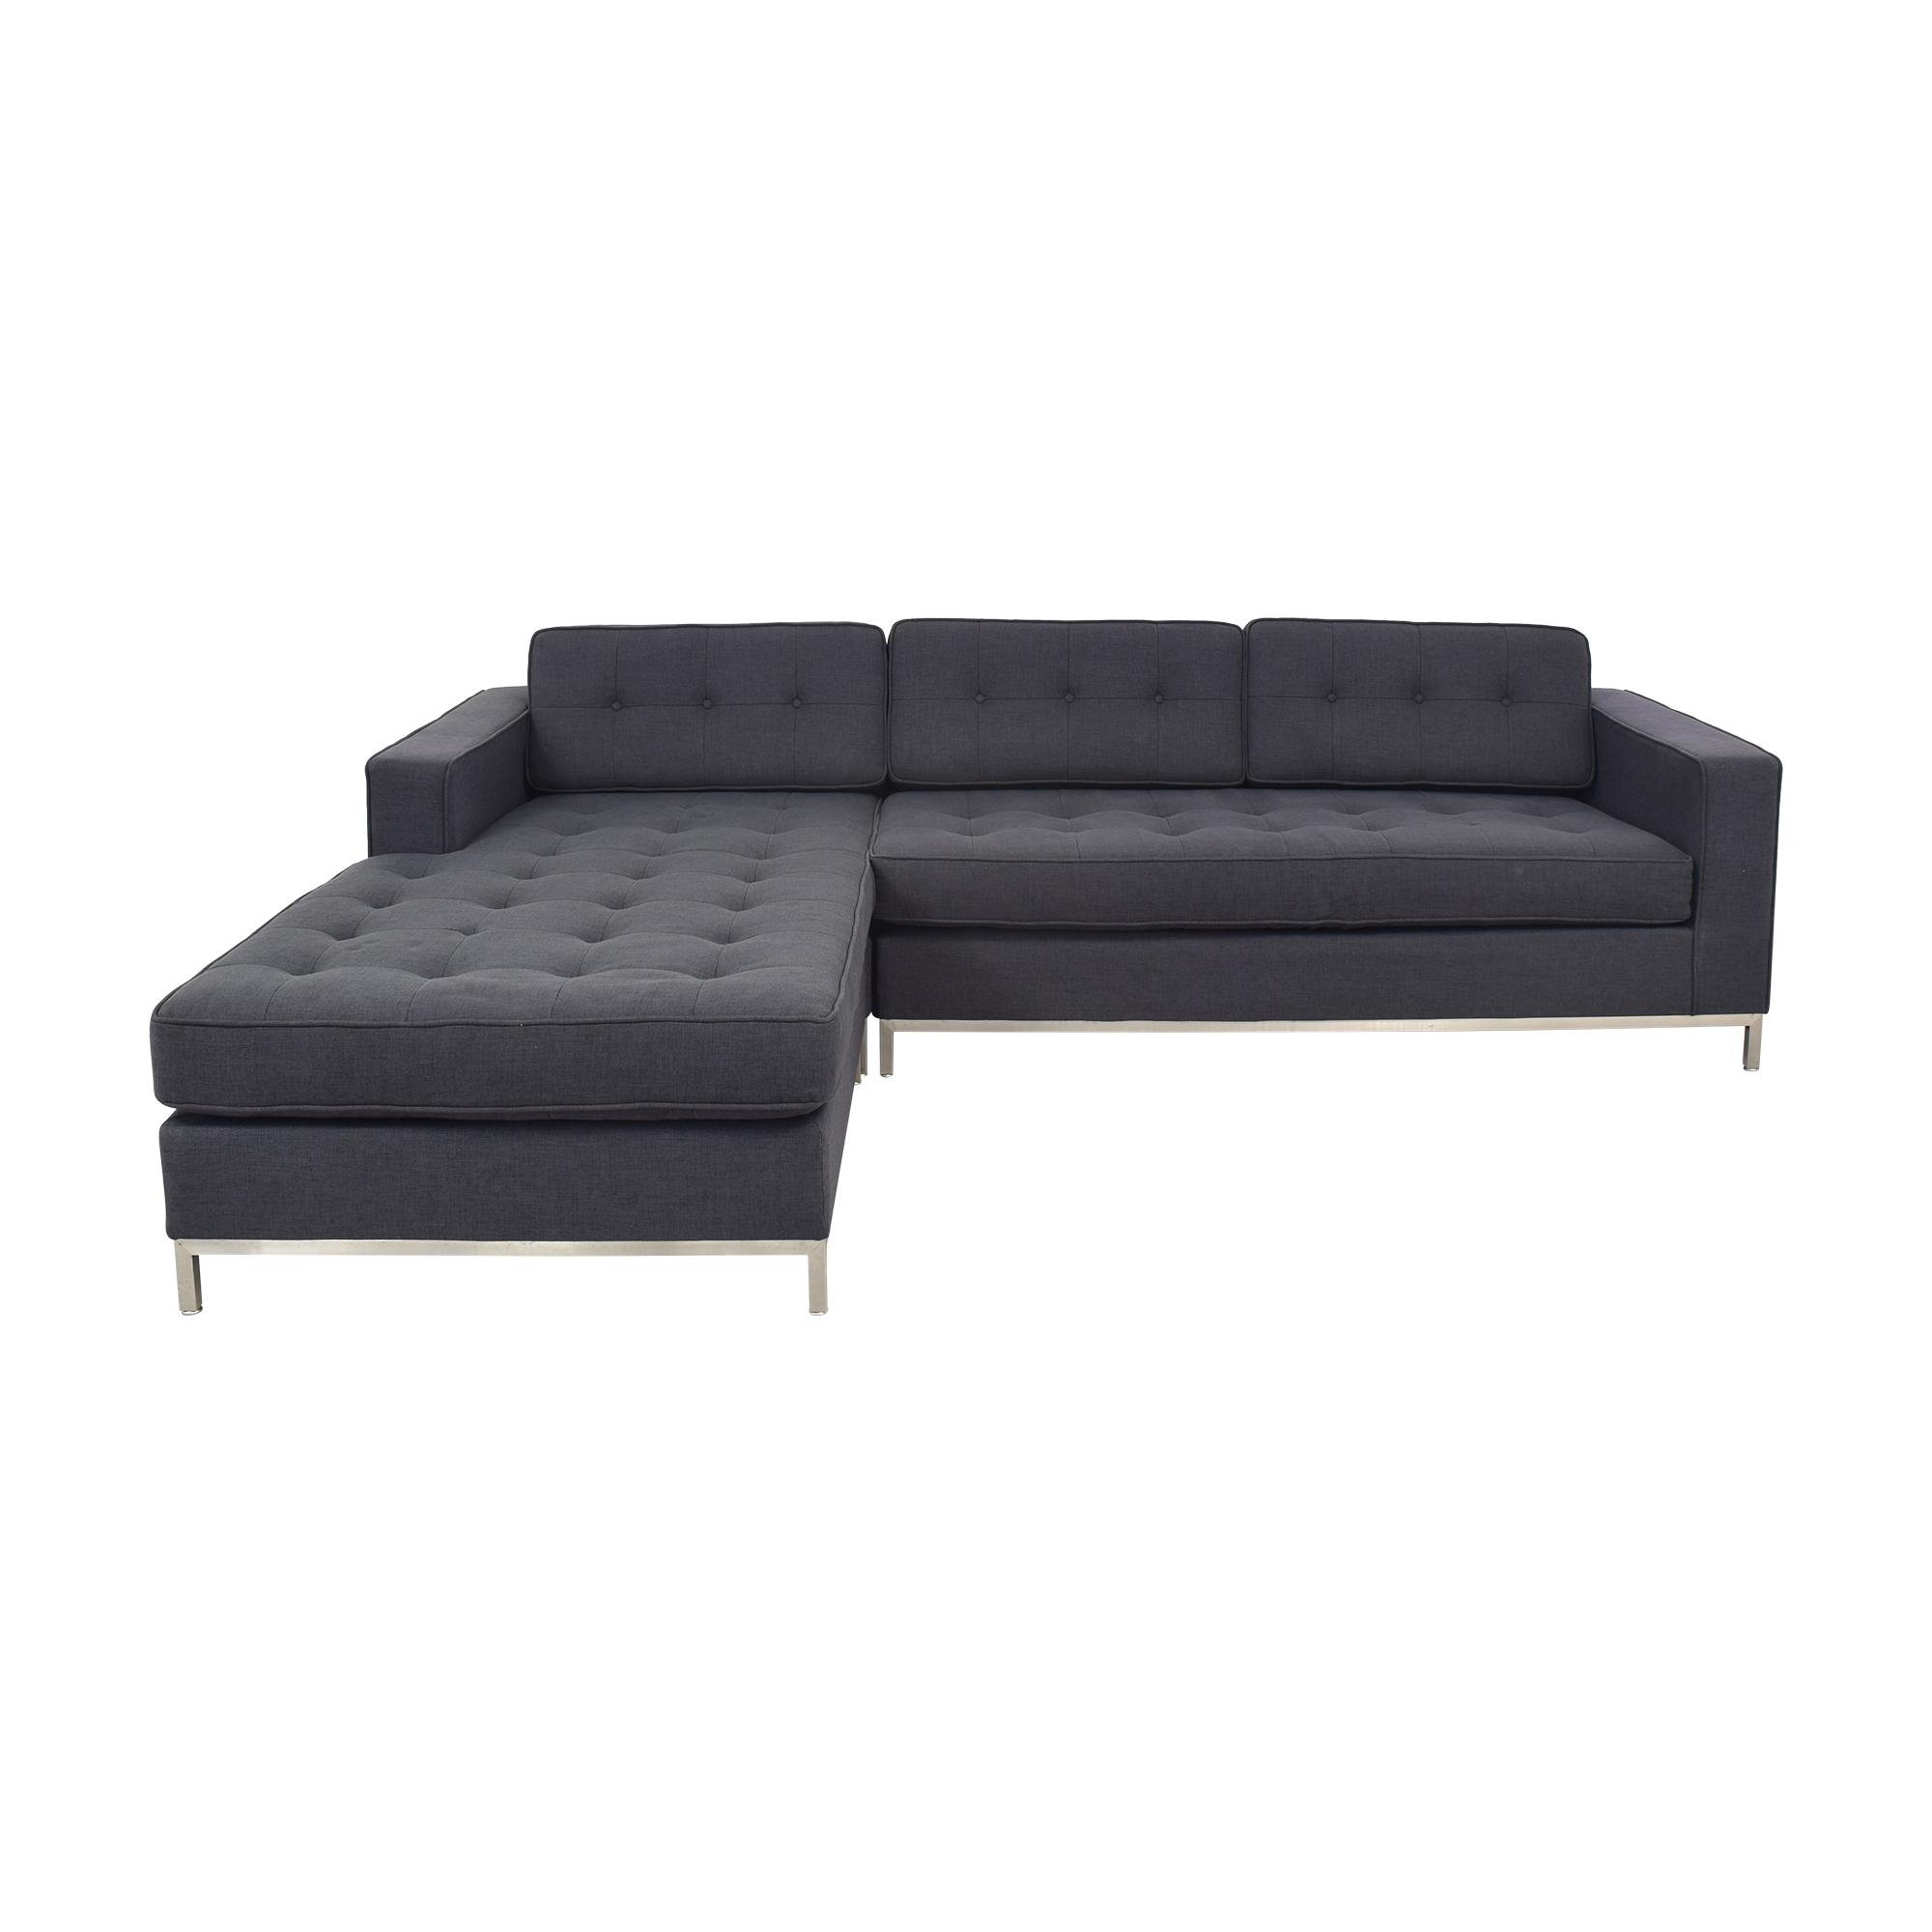 Gus Modern Gus Modern Jane Bi-Sectional Sofa on sale